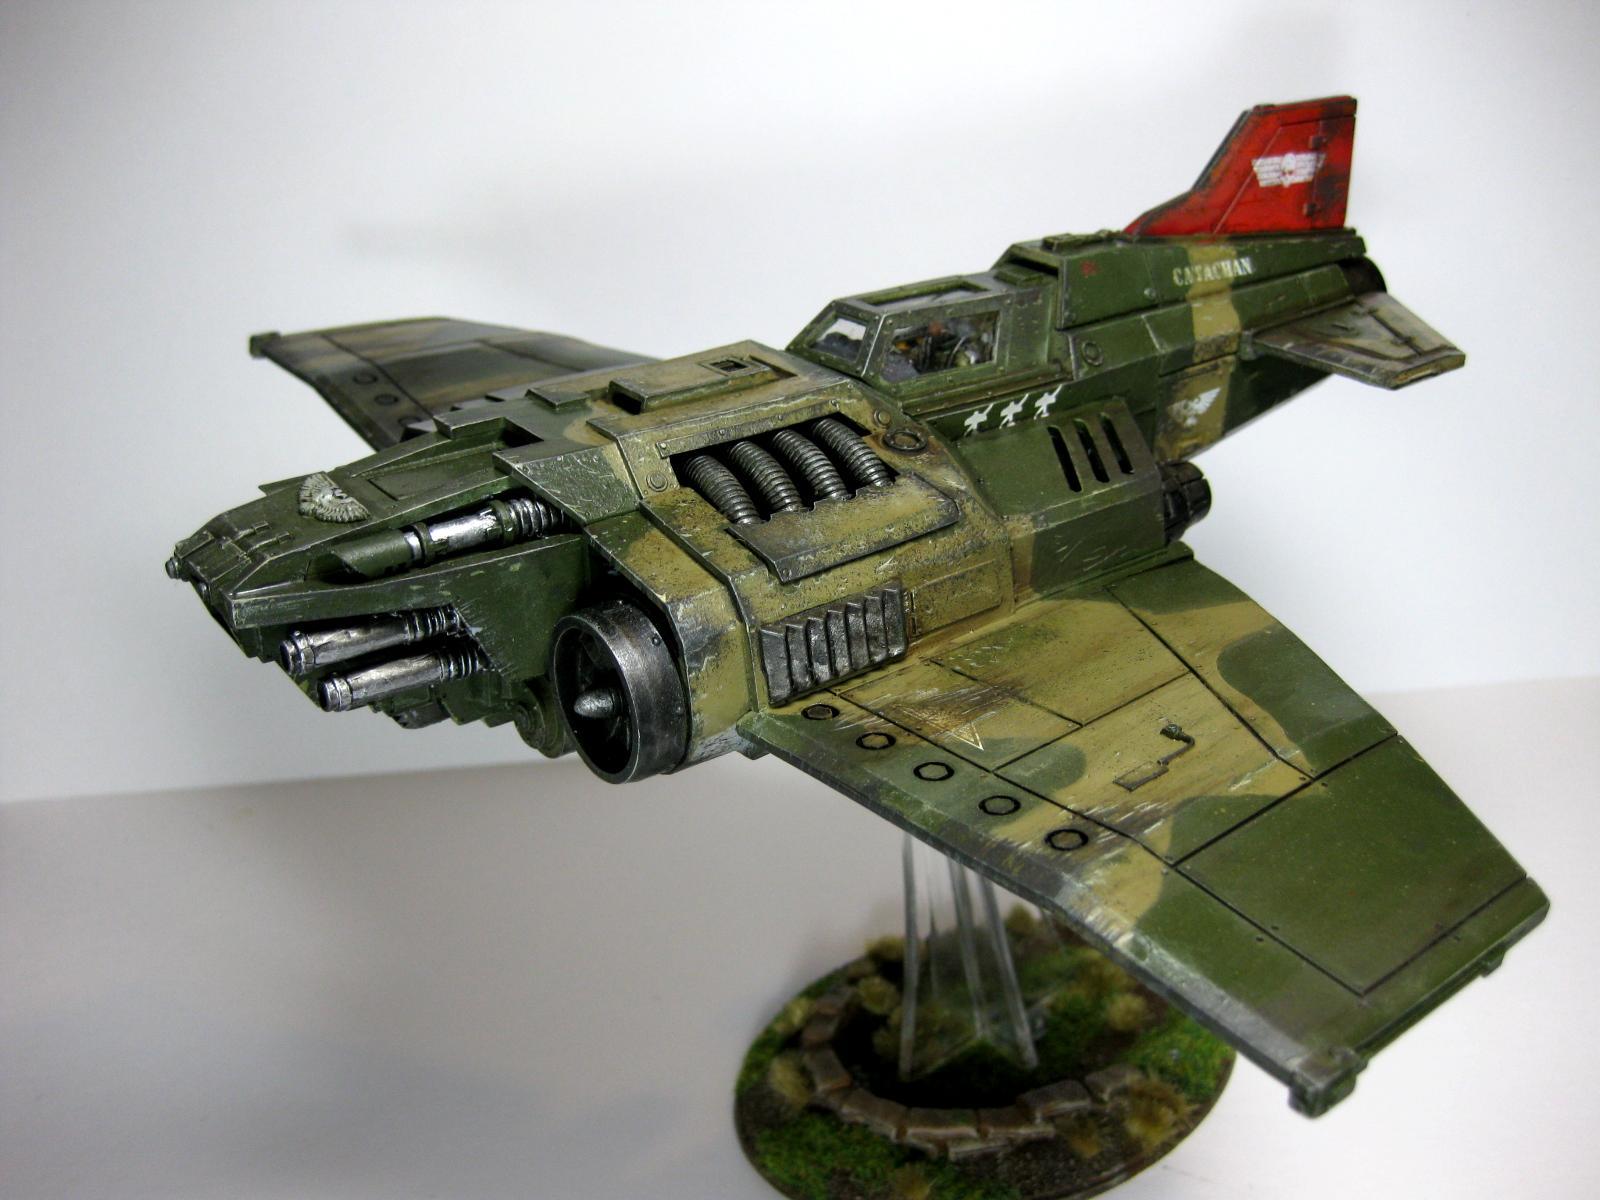 Catachan, Fighter, Heavy, Imperial, Navy, Thunderbolt, Warhammer 40,000